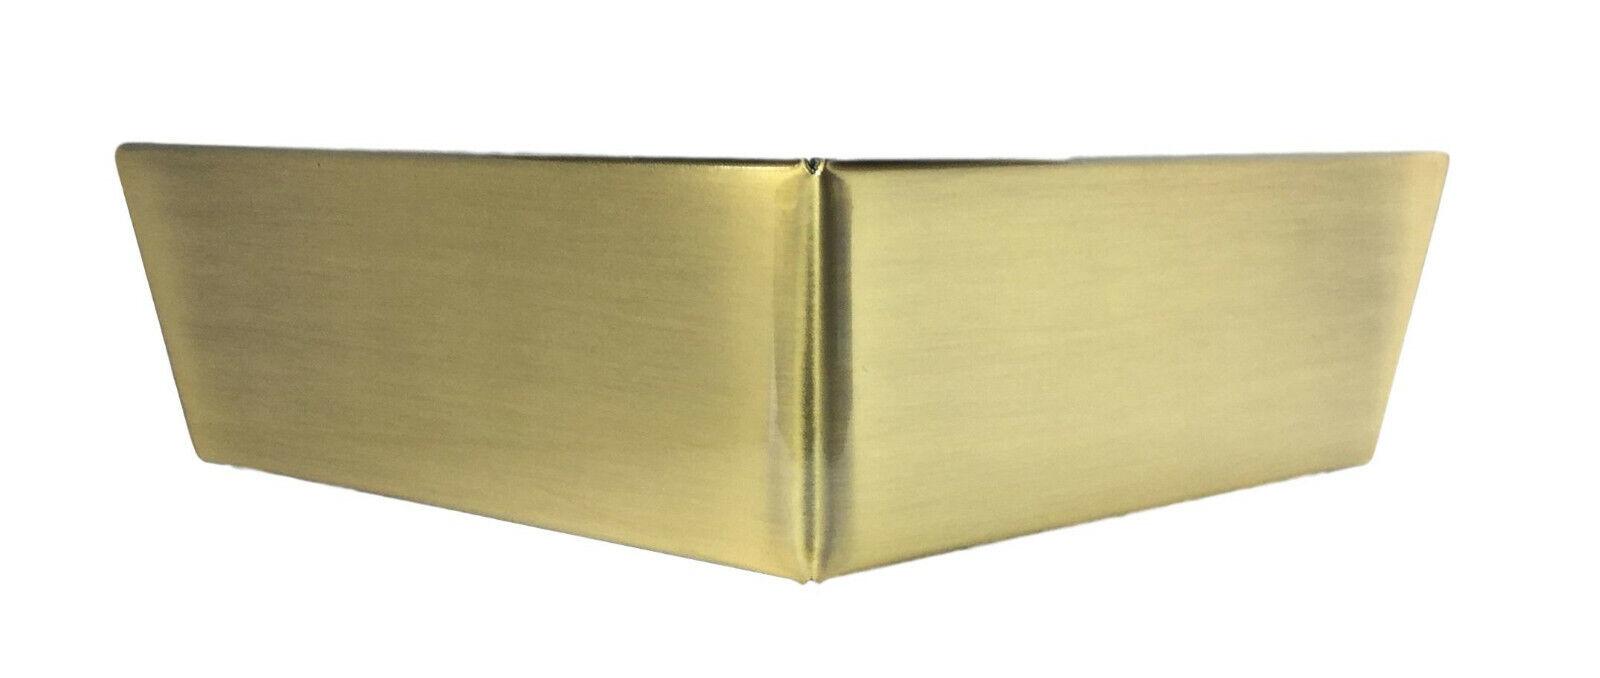 2-1/2″ Brushed Brass Metal Triangle Corner Furniture Legs – Set of 4 Furniture